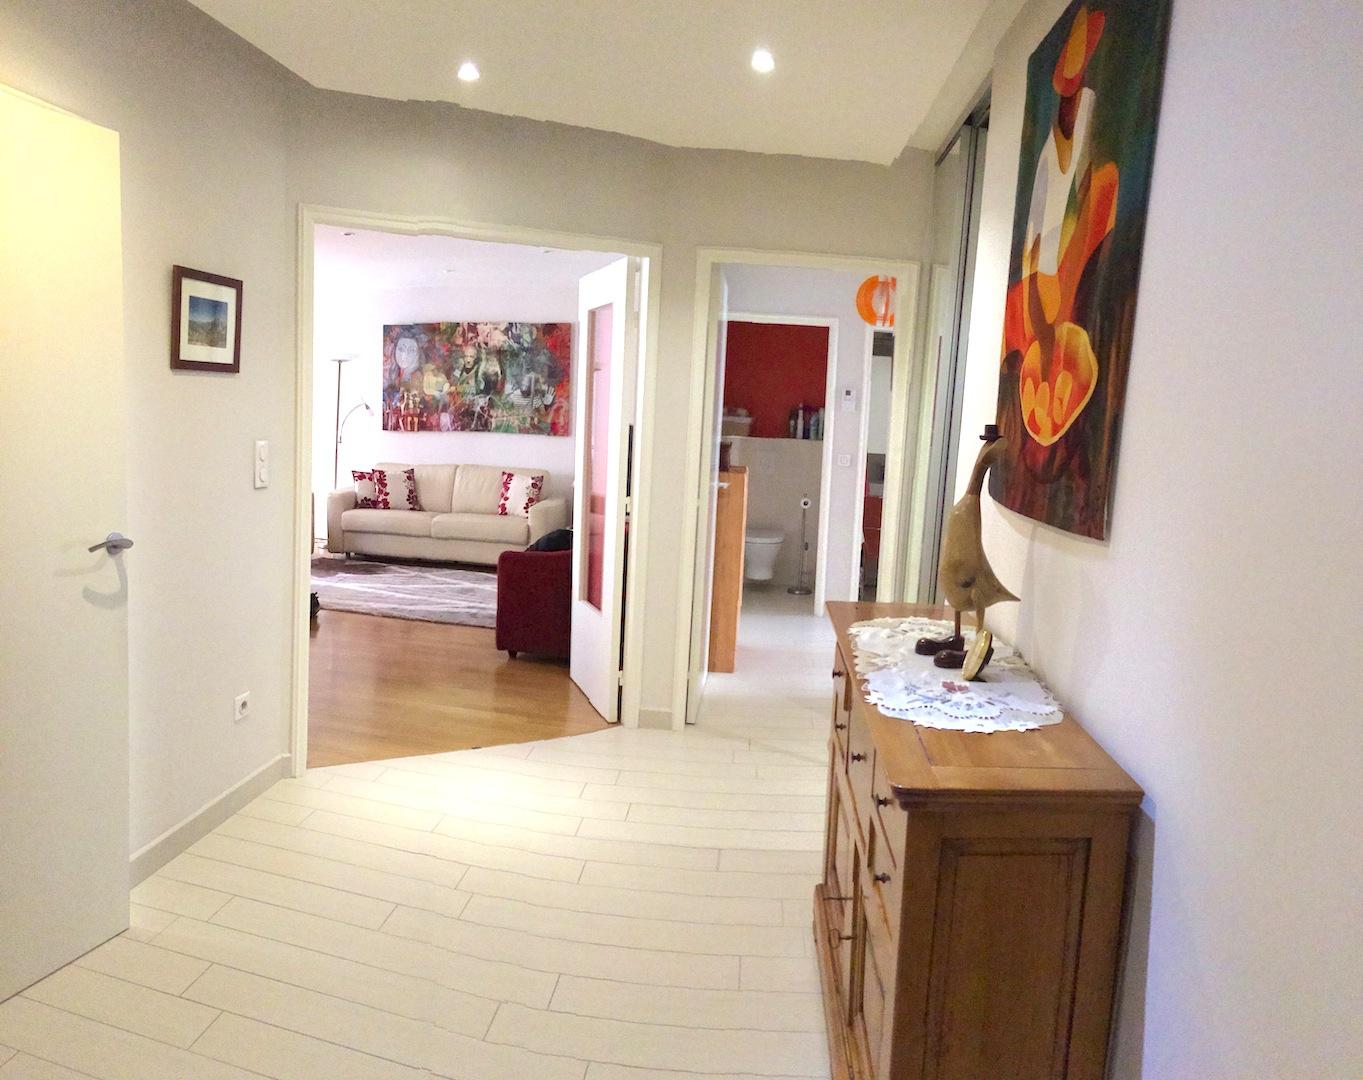 vente appartement t3 avec loggia. Black Bedroom Furniture Sets. Home Design Ideas